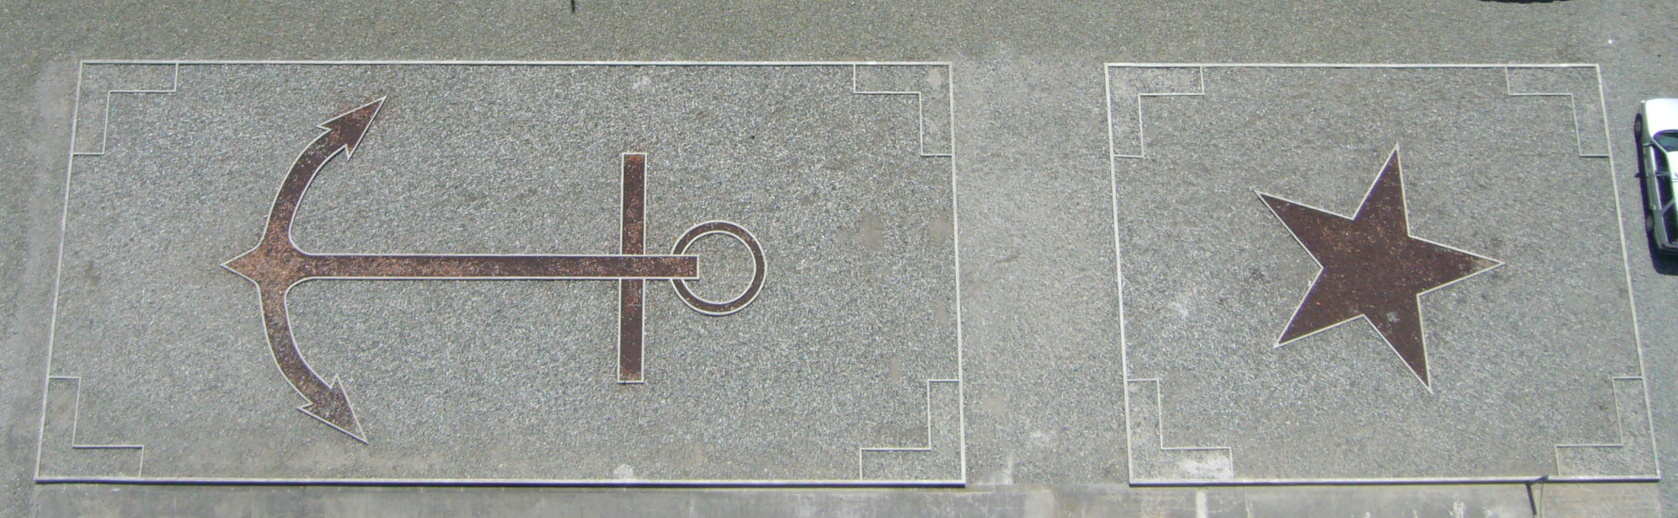 fichier:decoration cours phare eckmuhl — wikipédia